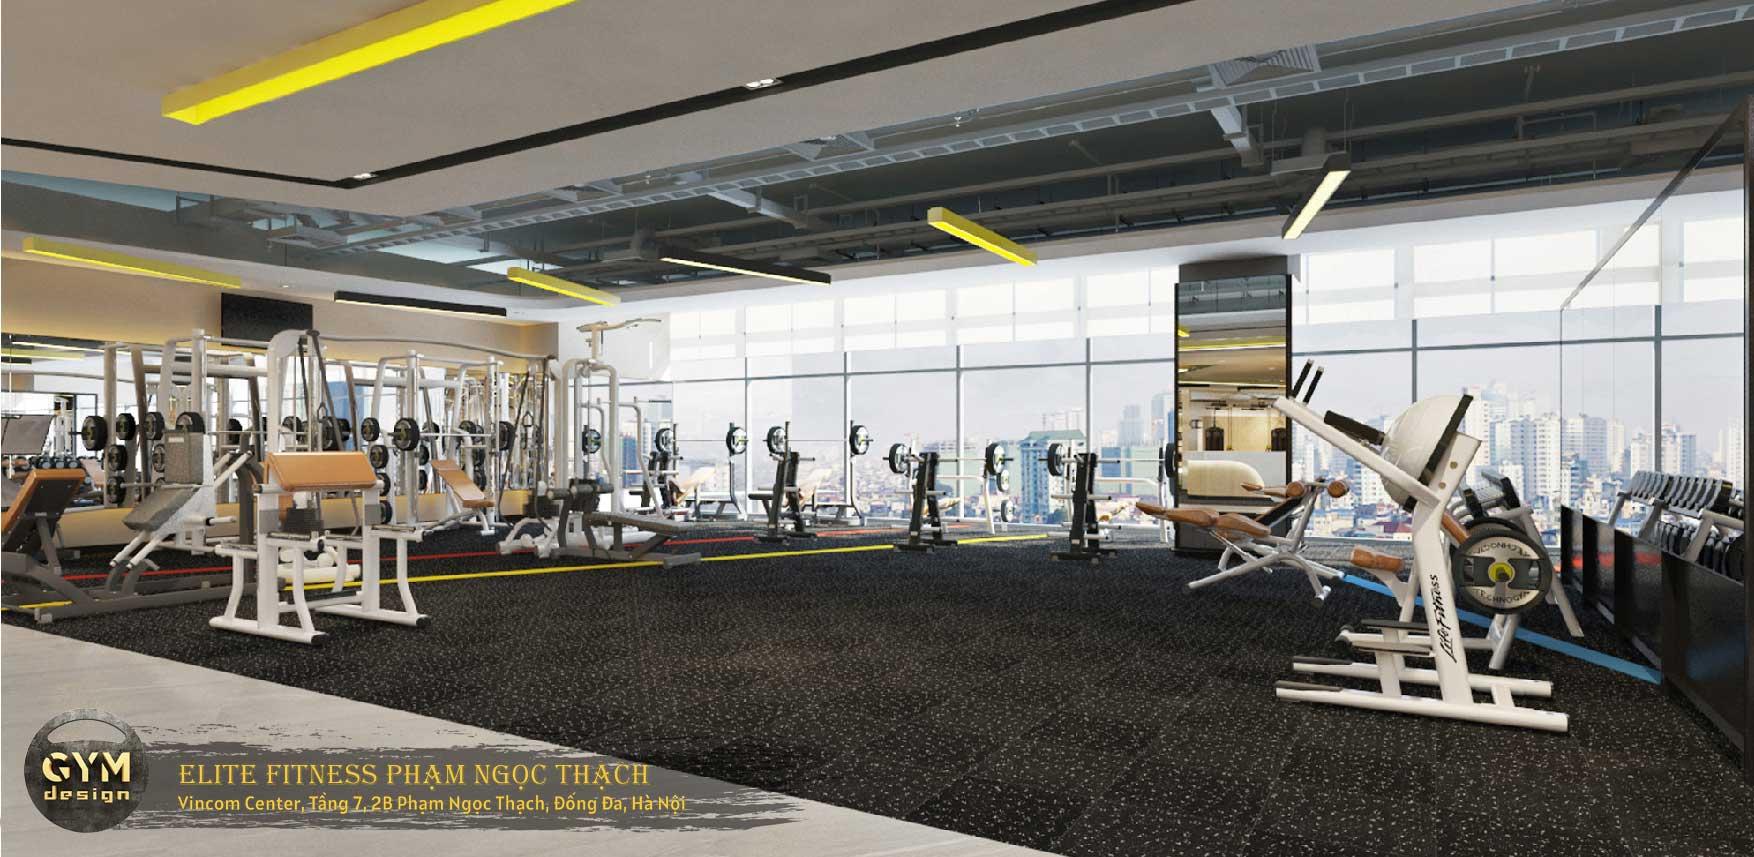 du-an-elite-fitness-pham-ngoc-thach-30